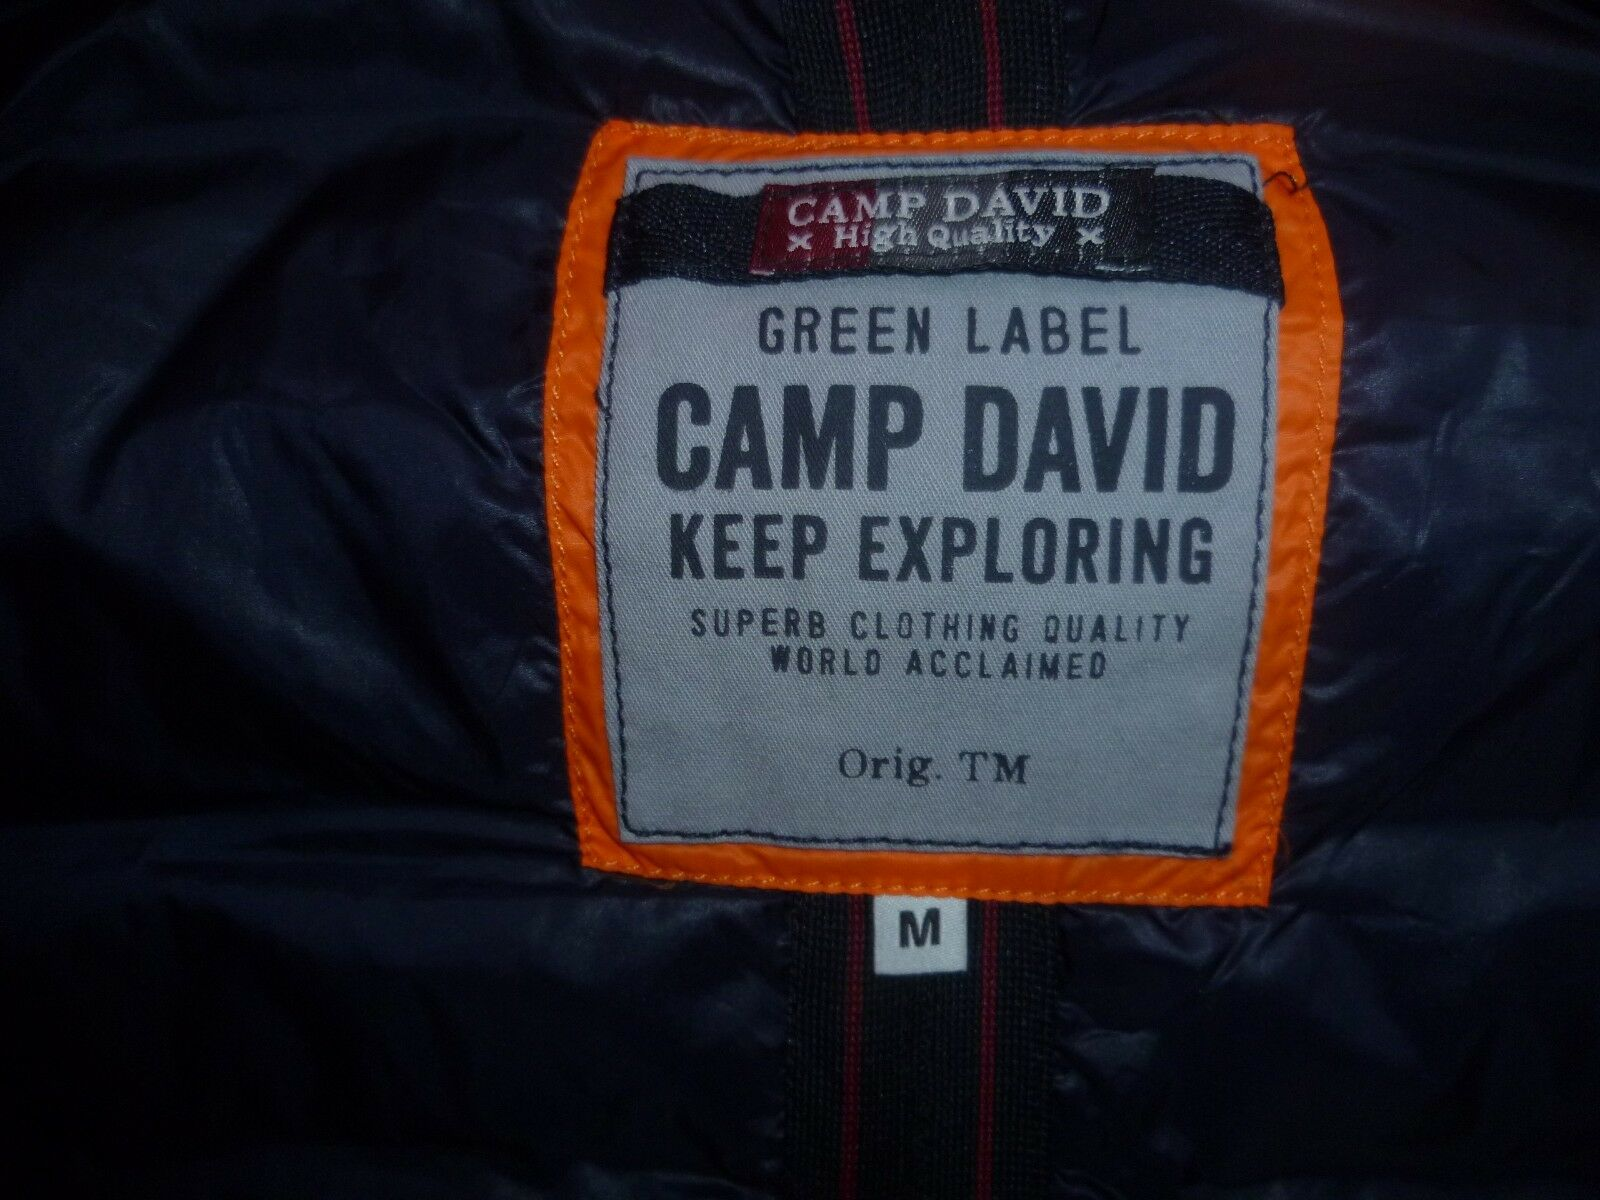 TOP NEU Herren Männer Outdoor Weste Steppweste mit Kapuze Kapuze Kapuze Orange CAMP DAVID Gr.M ecc6c6